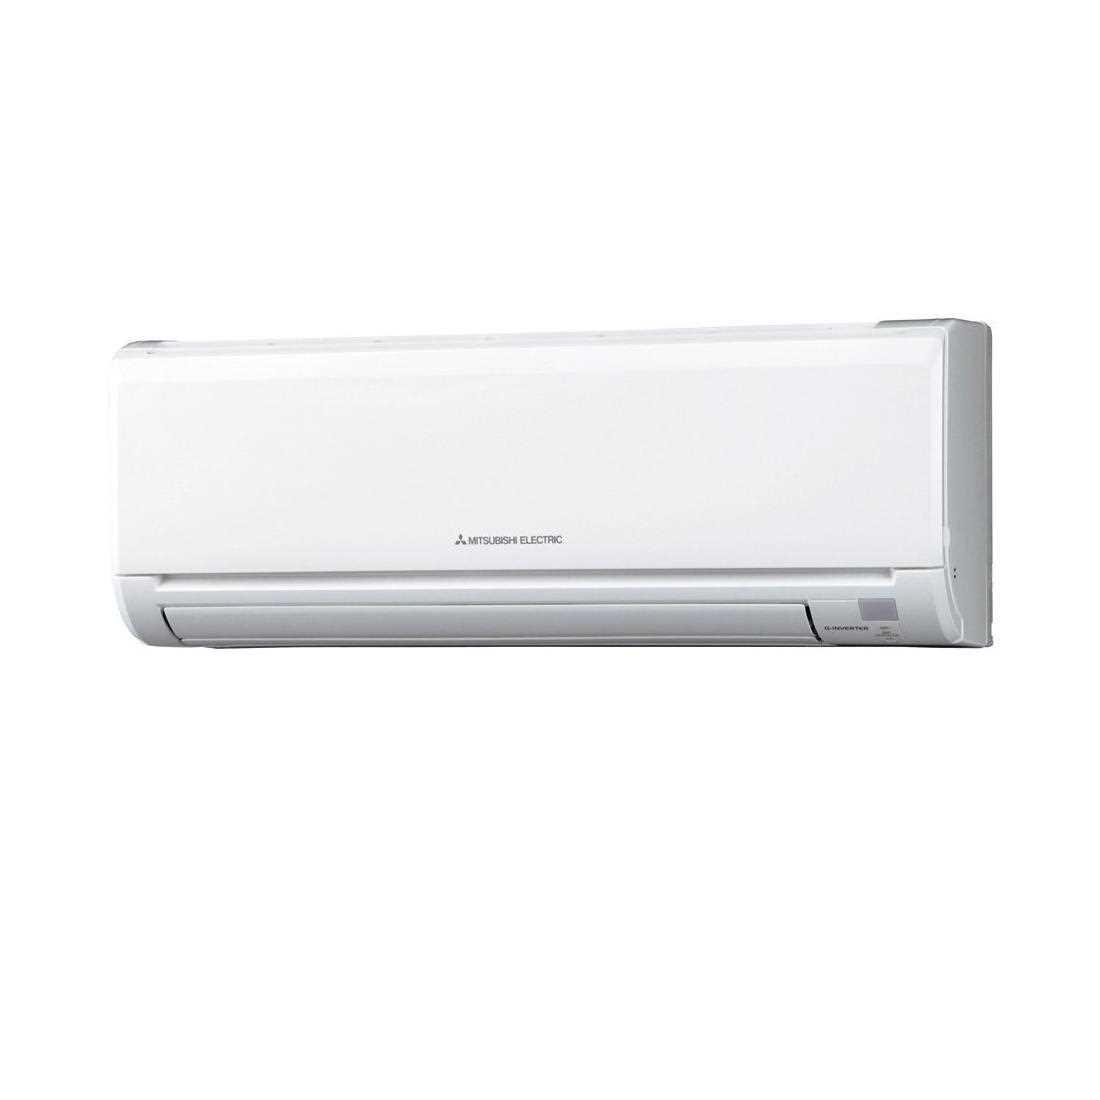 mitsubishi air conditioner price list in india 2017 lowest mitsubishi air conditioner prices. Black Bedroom Furniture Sets. Home Design Ideas